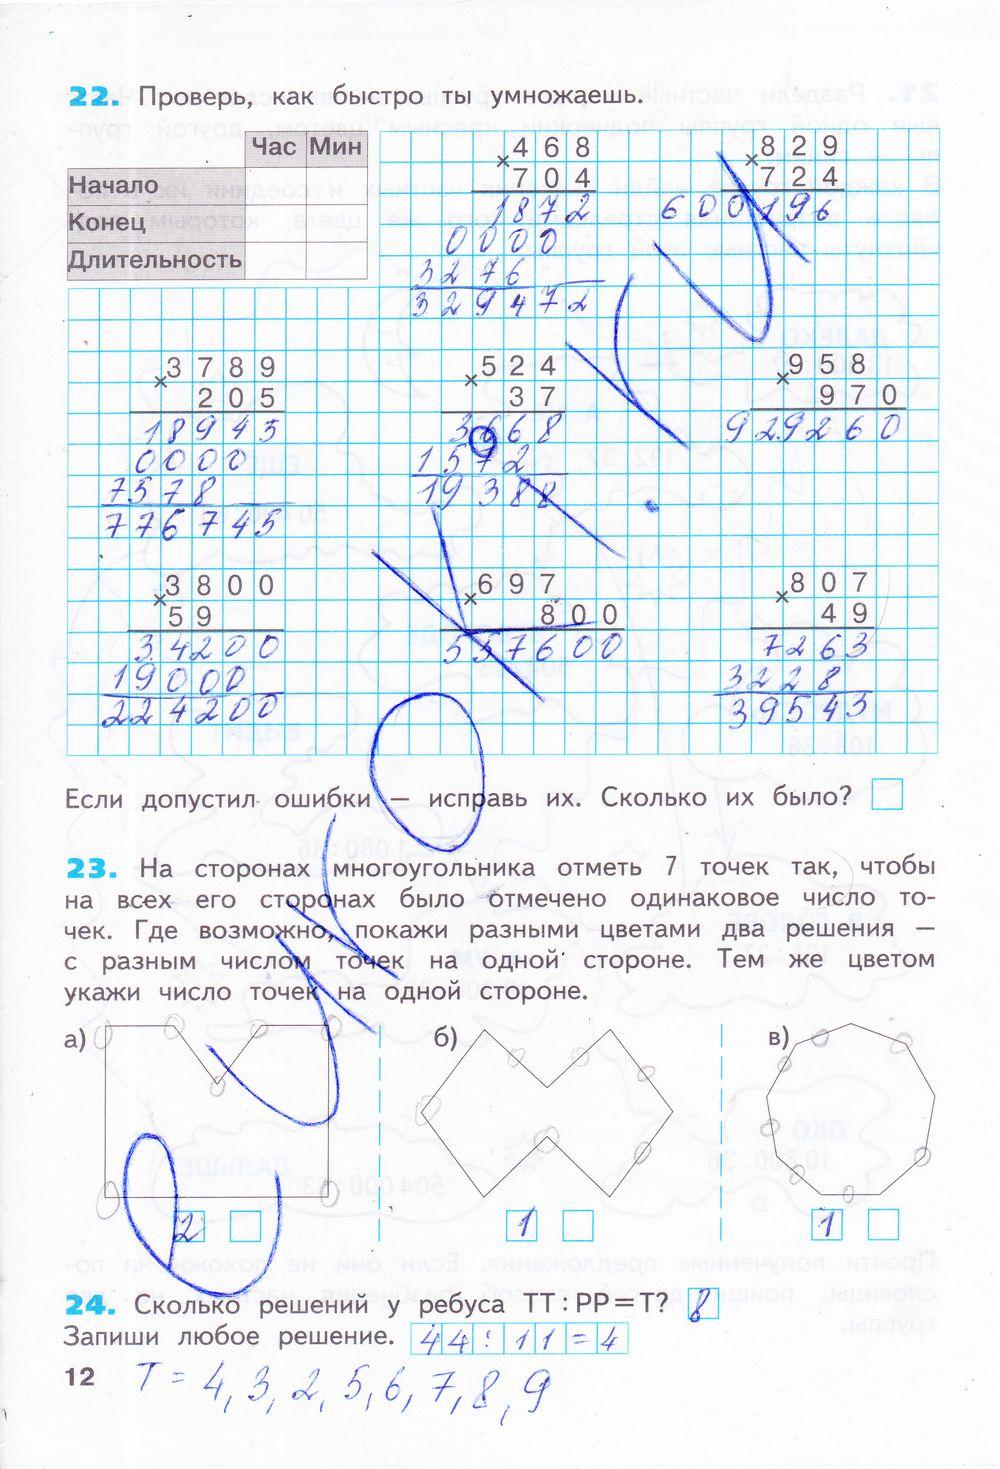 Гдз по матиматике 4 класс райкина т.н